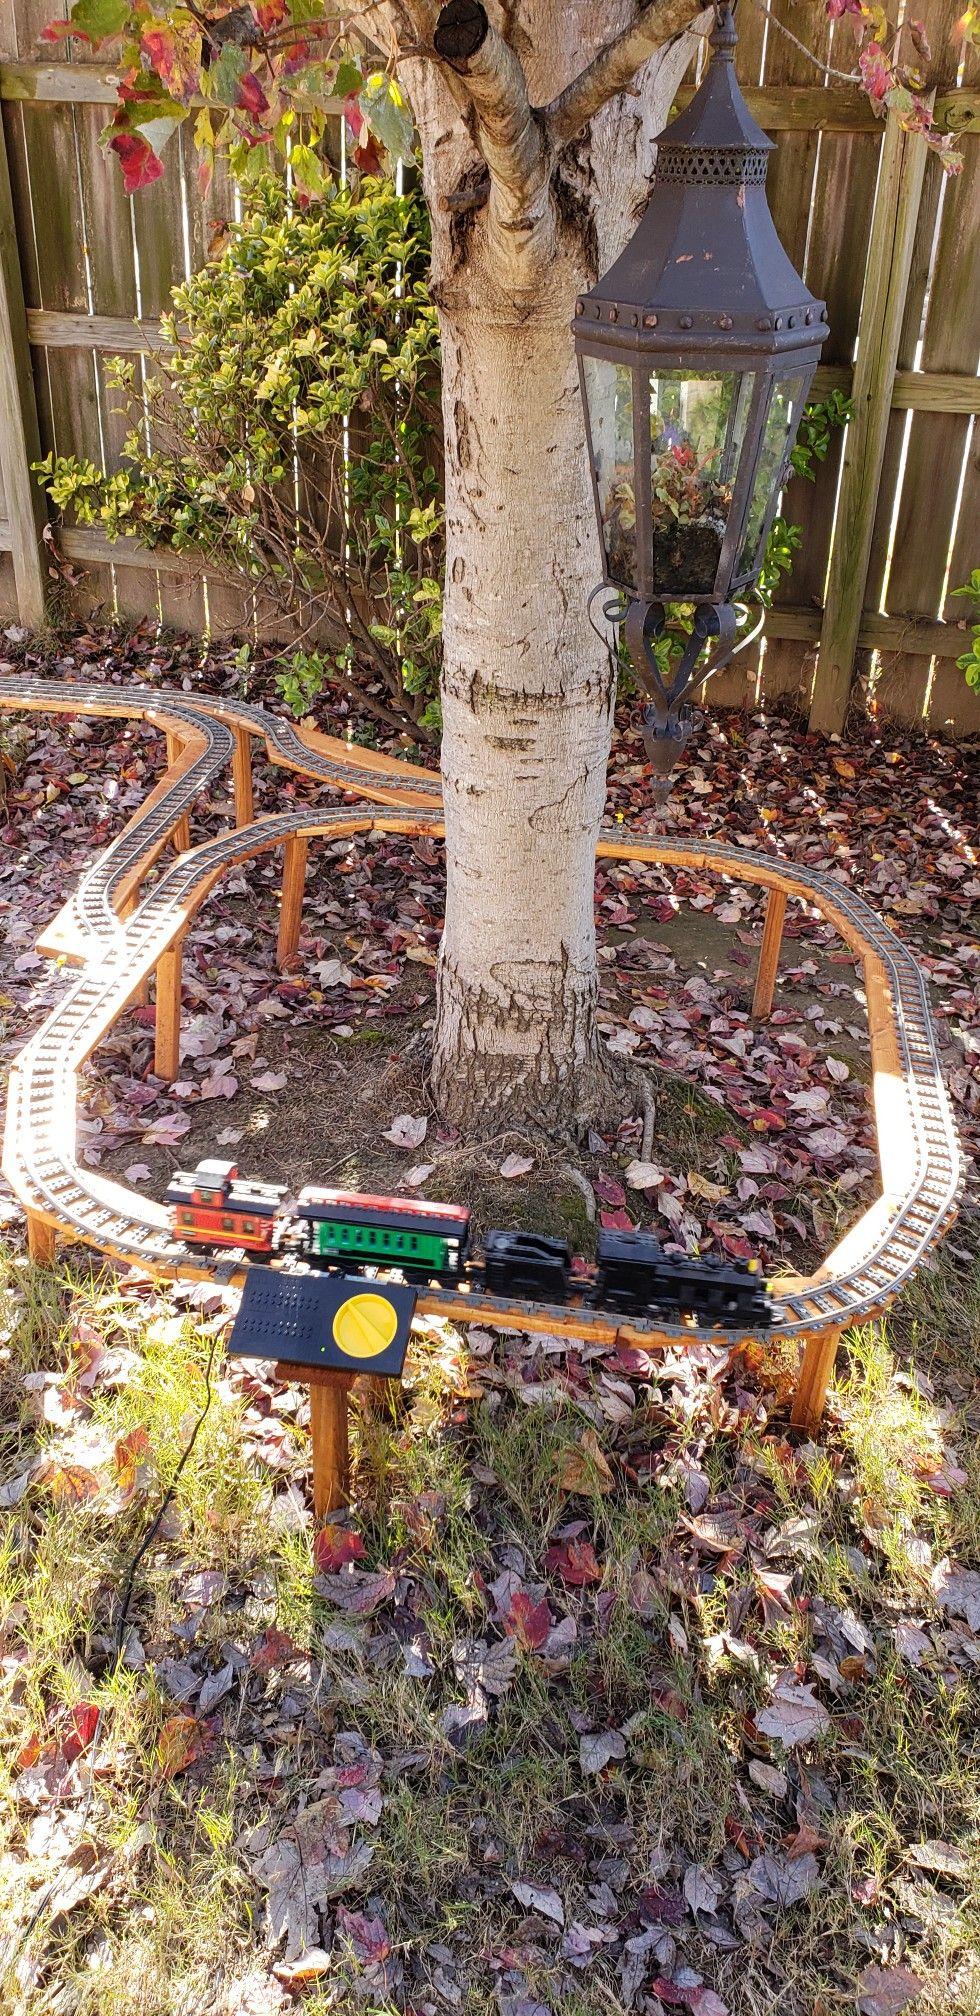 Lego Garden Railroad In My Back Yard Garden Railroad Garden Trains Model Railroad Diy backyard train plans